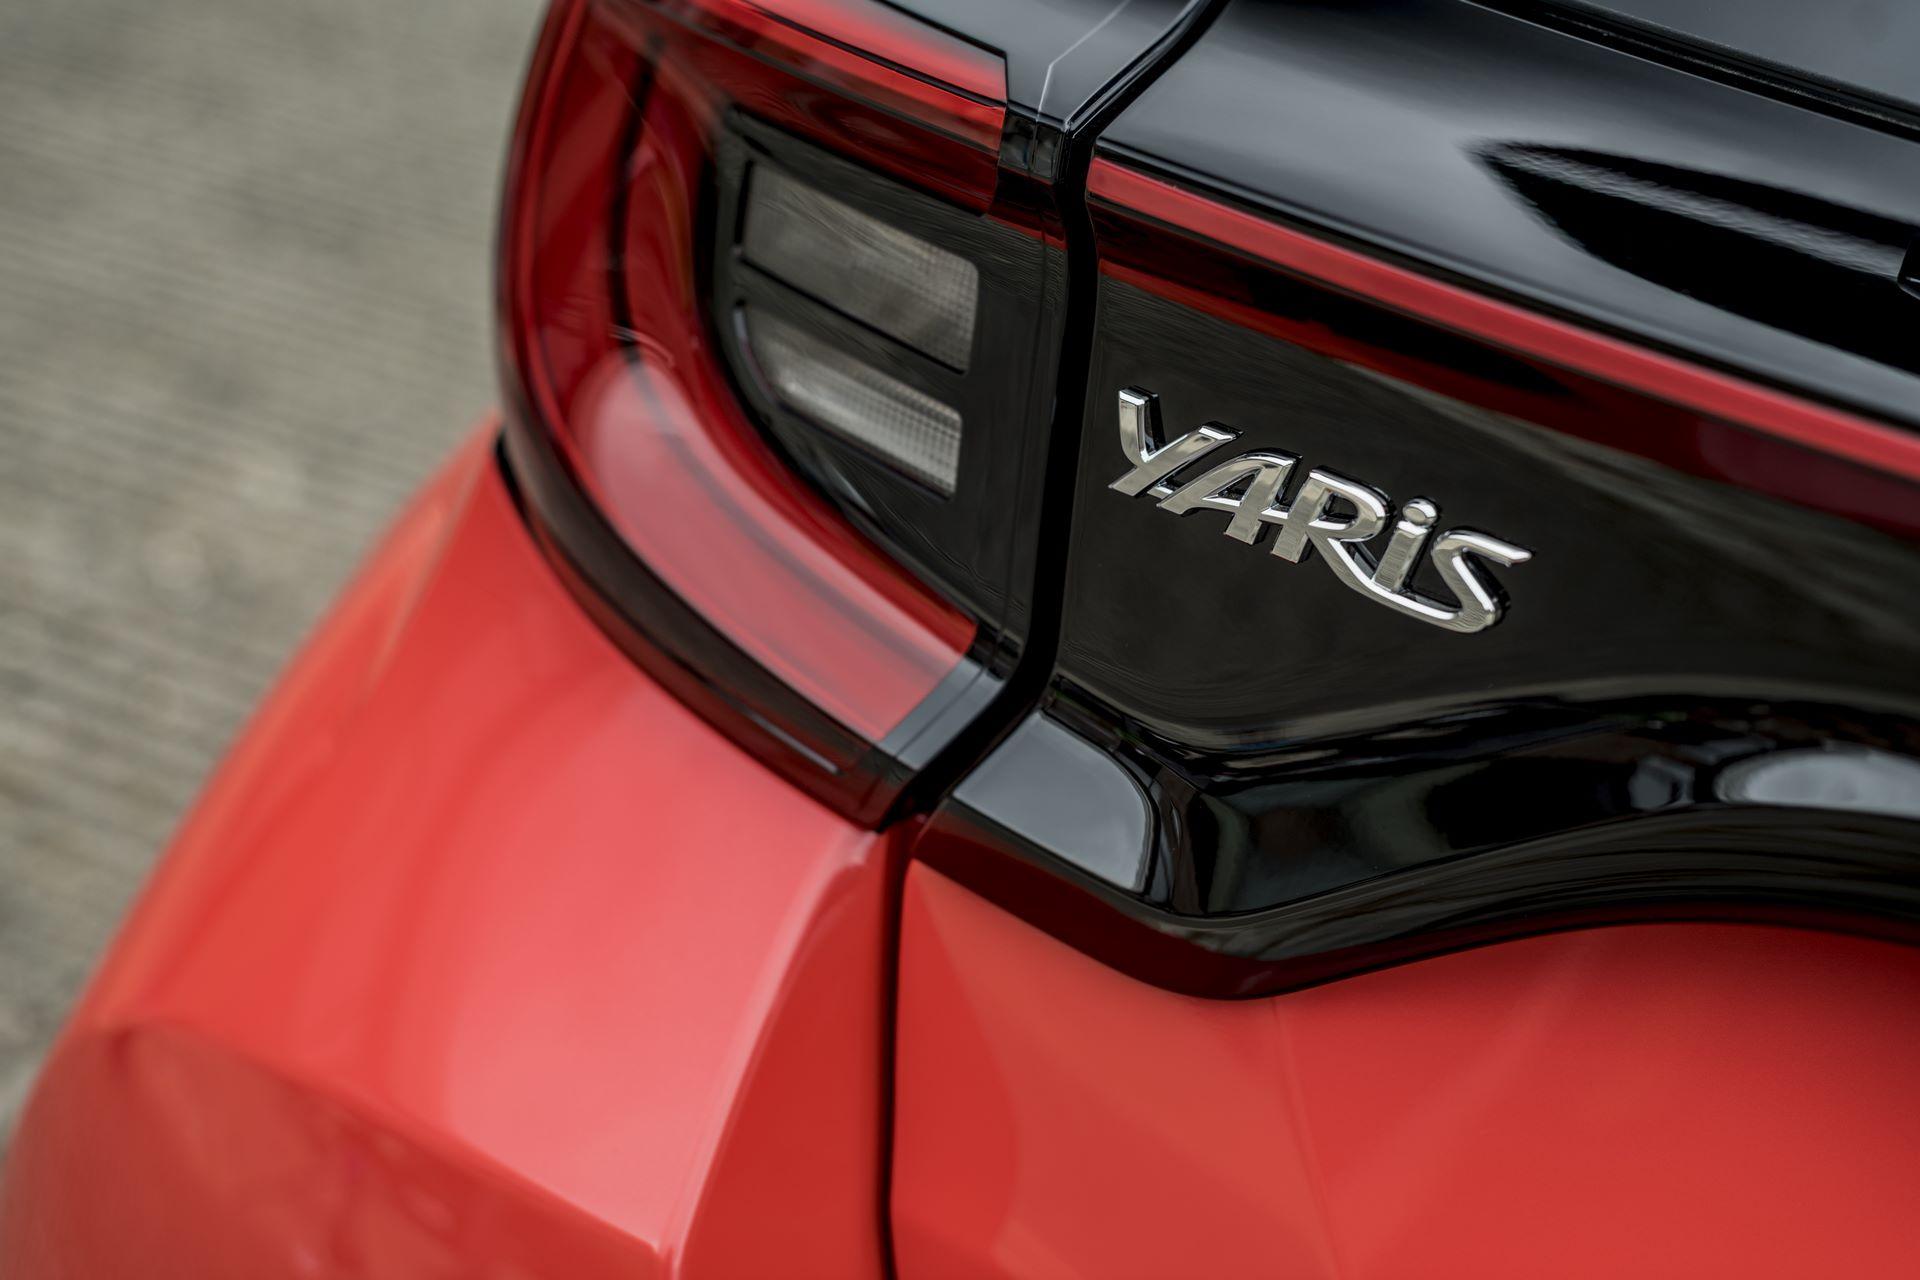 Toyota-Yaris-2020-95